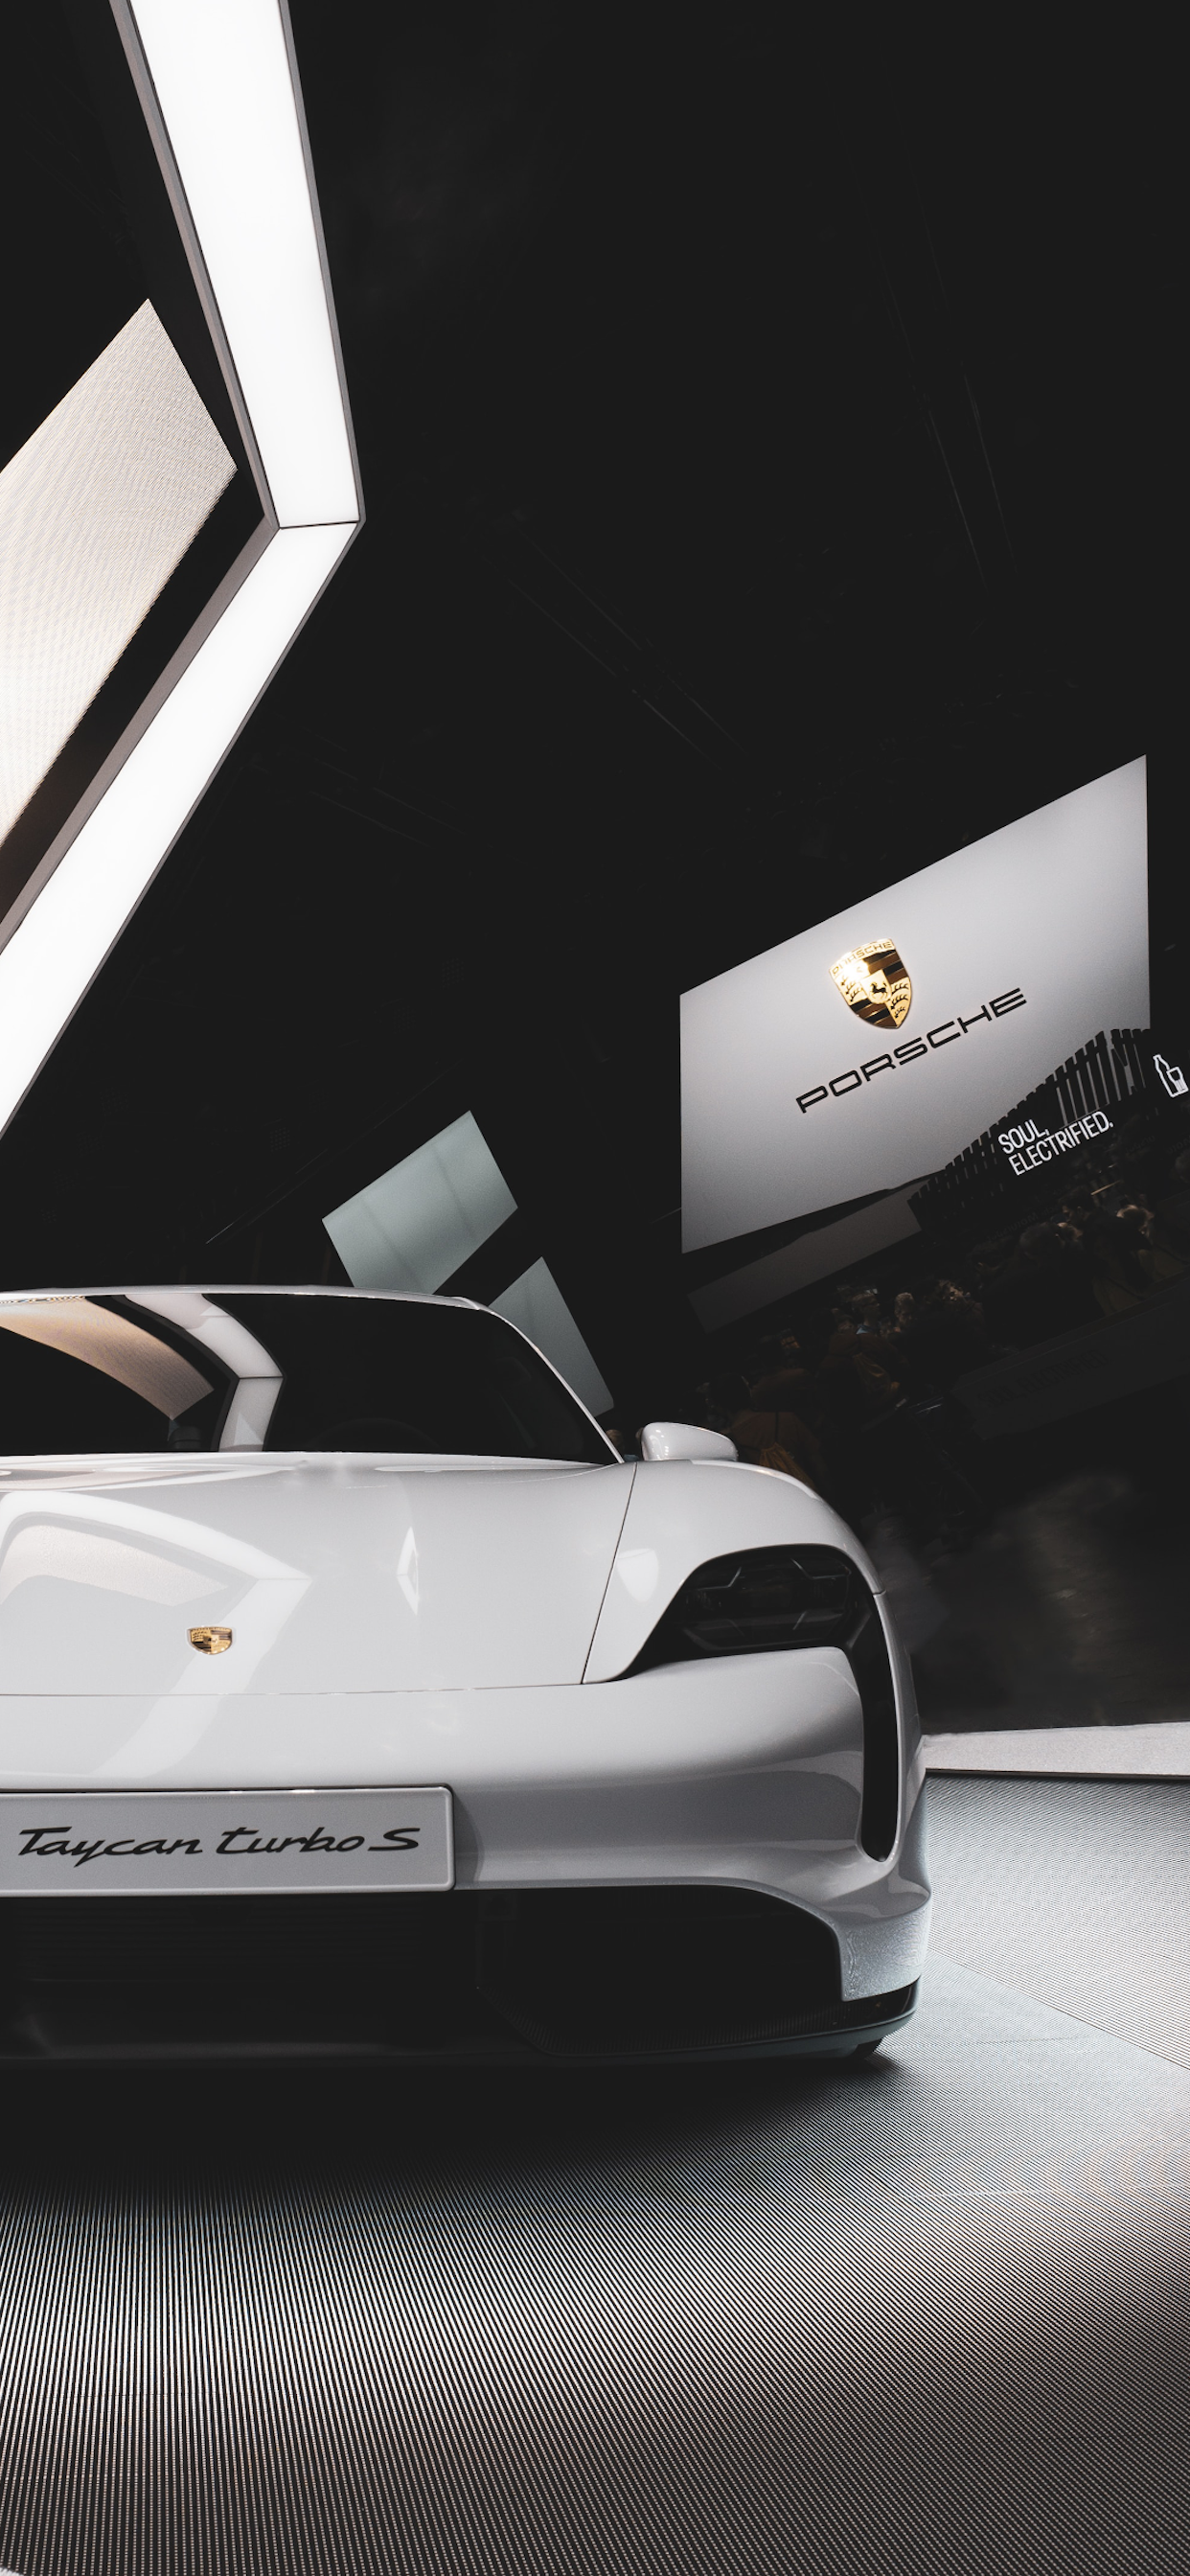 iPhone wallpapers car porsche deutschland Porsche